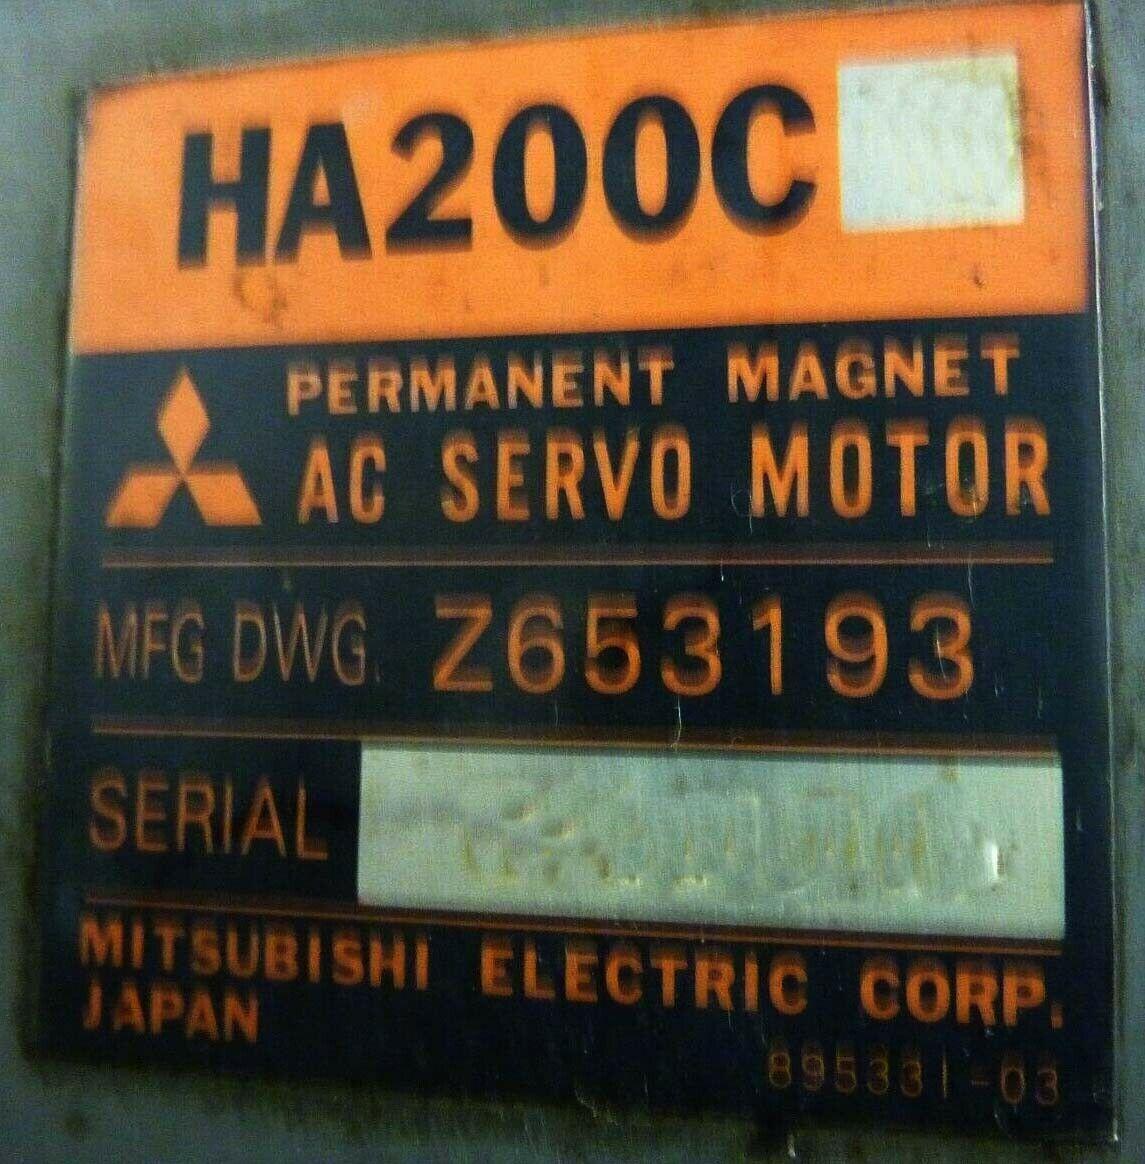 Mitsubishi Axis Motor Servo Motor HA200S Z653193